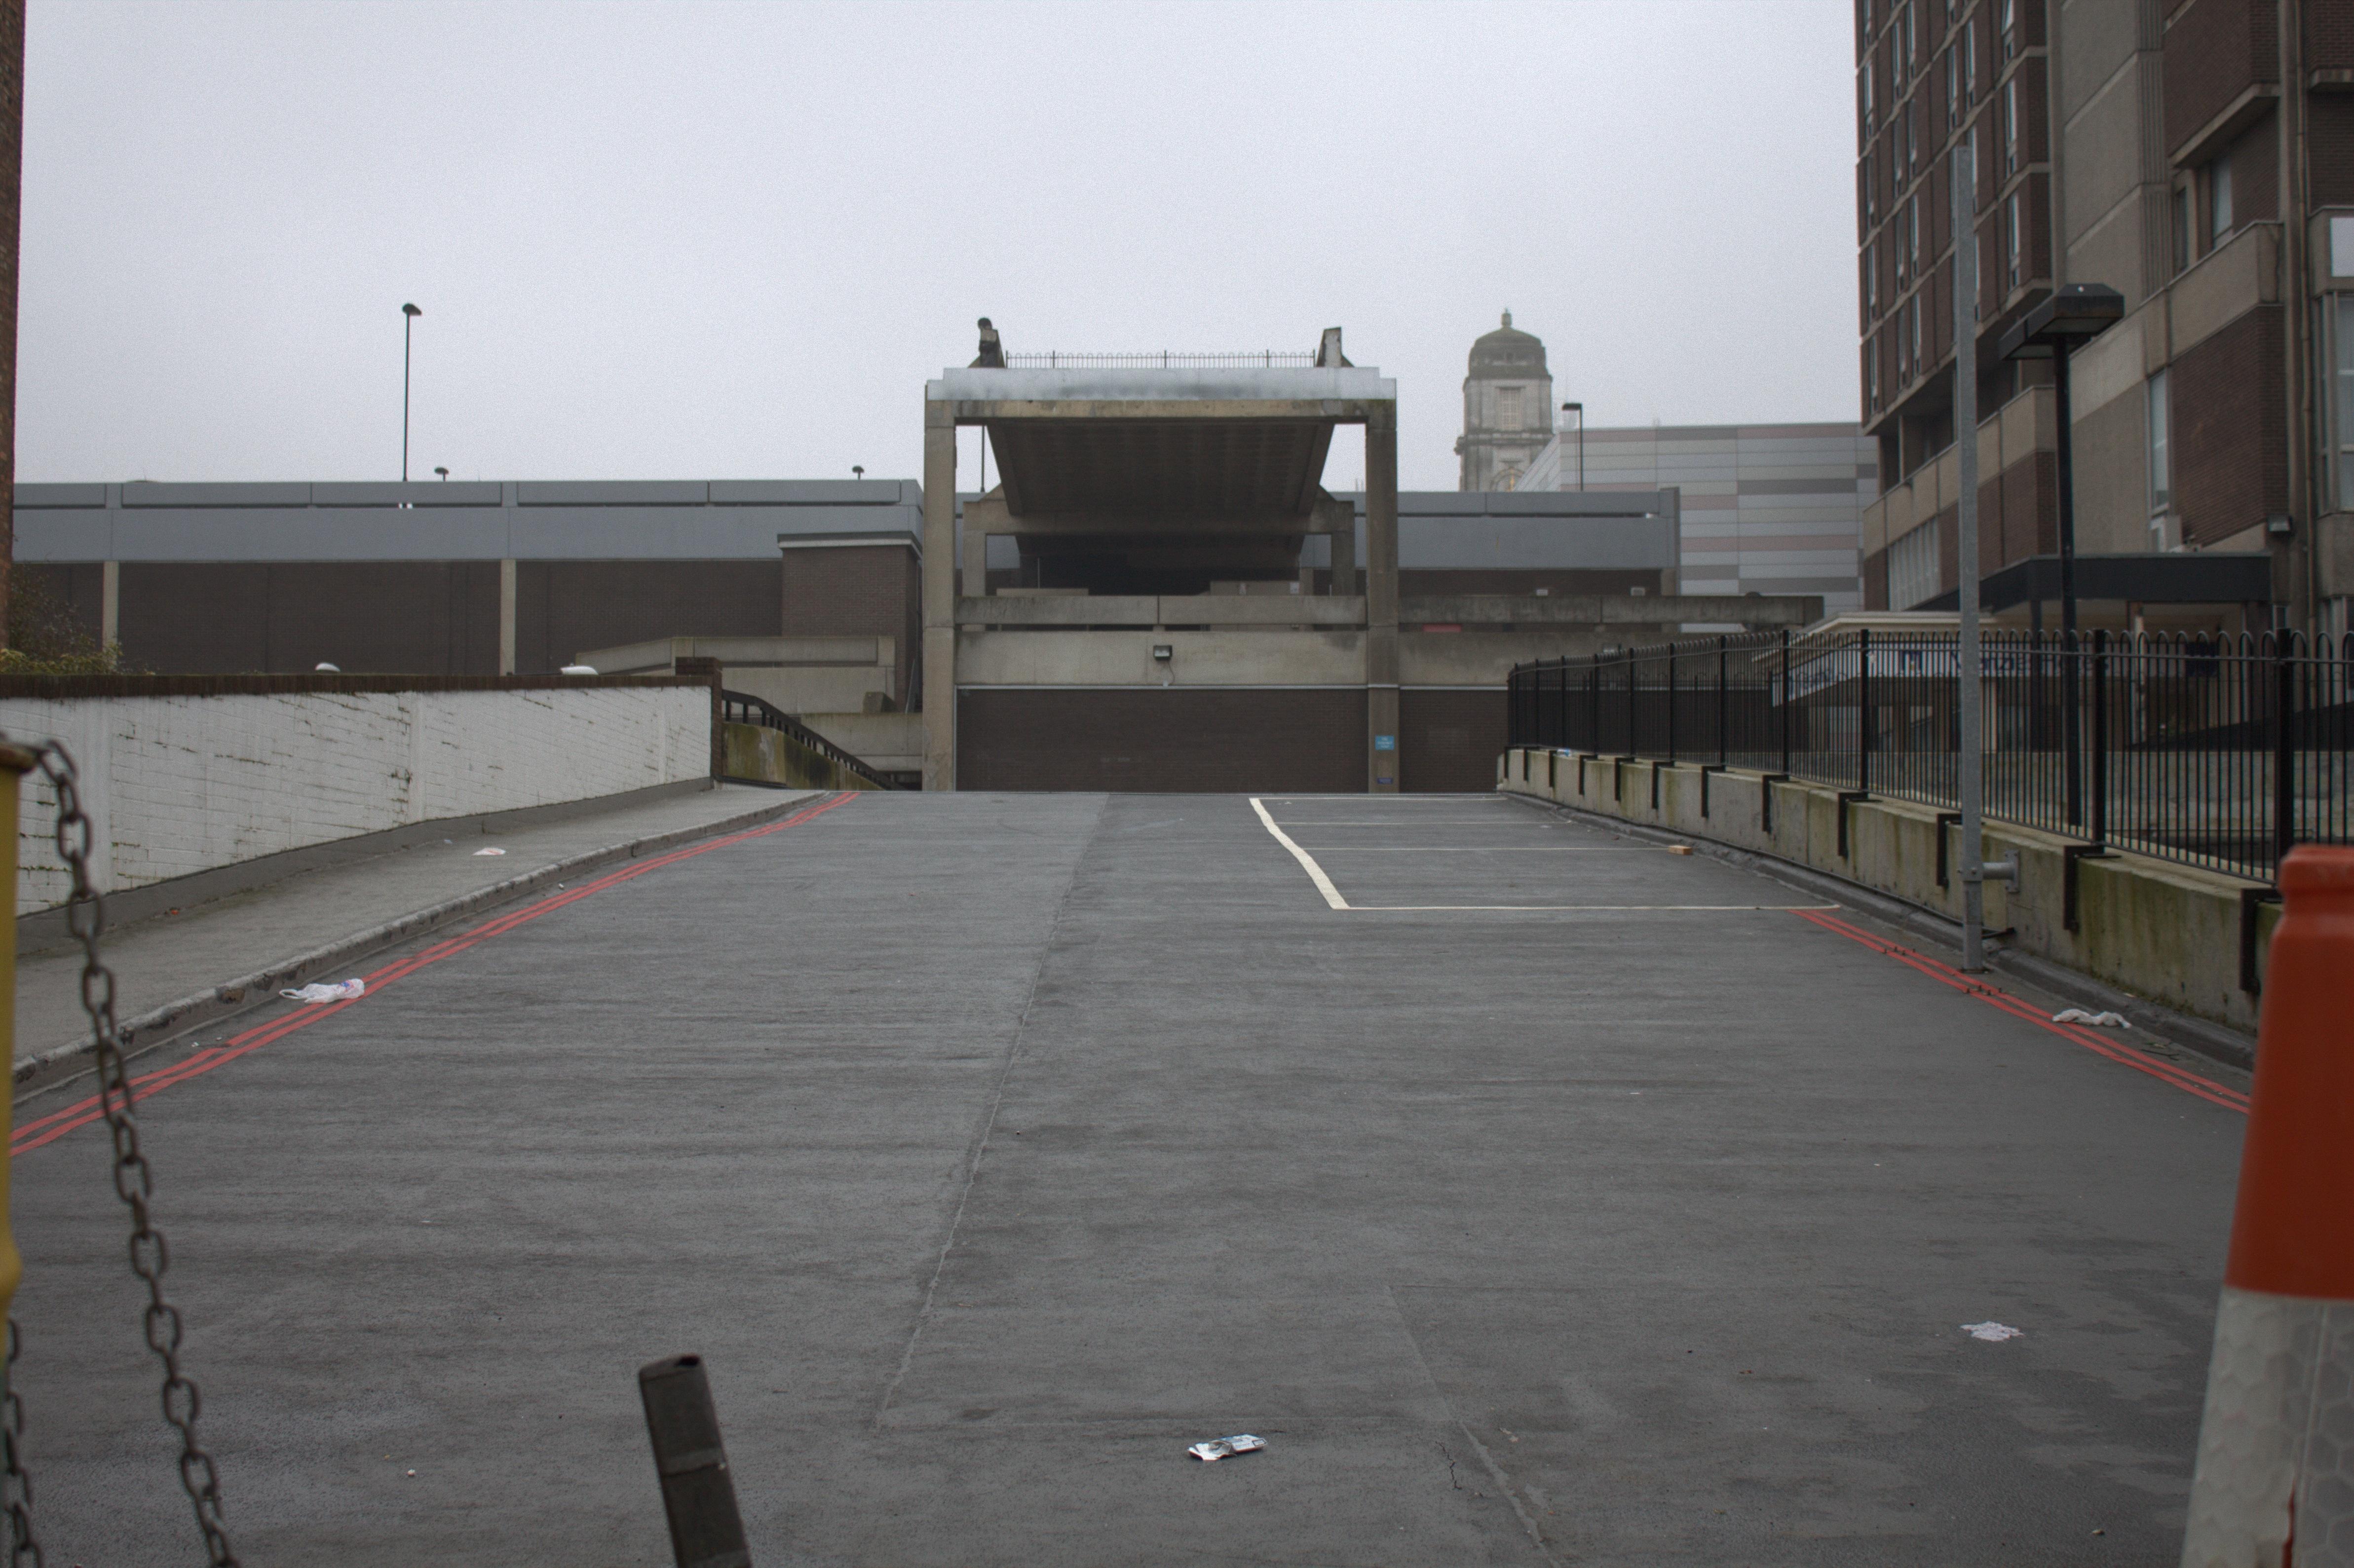 Bildet : tak, parkering, by, asfalt, gangvei, lane, stadion, parkeringsplass, arena, veidekke ...